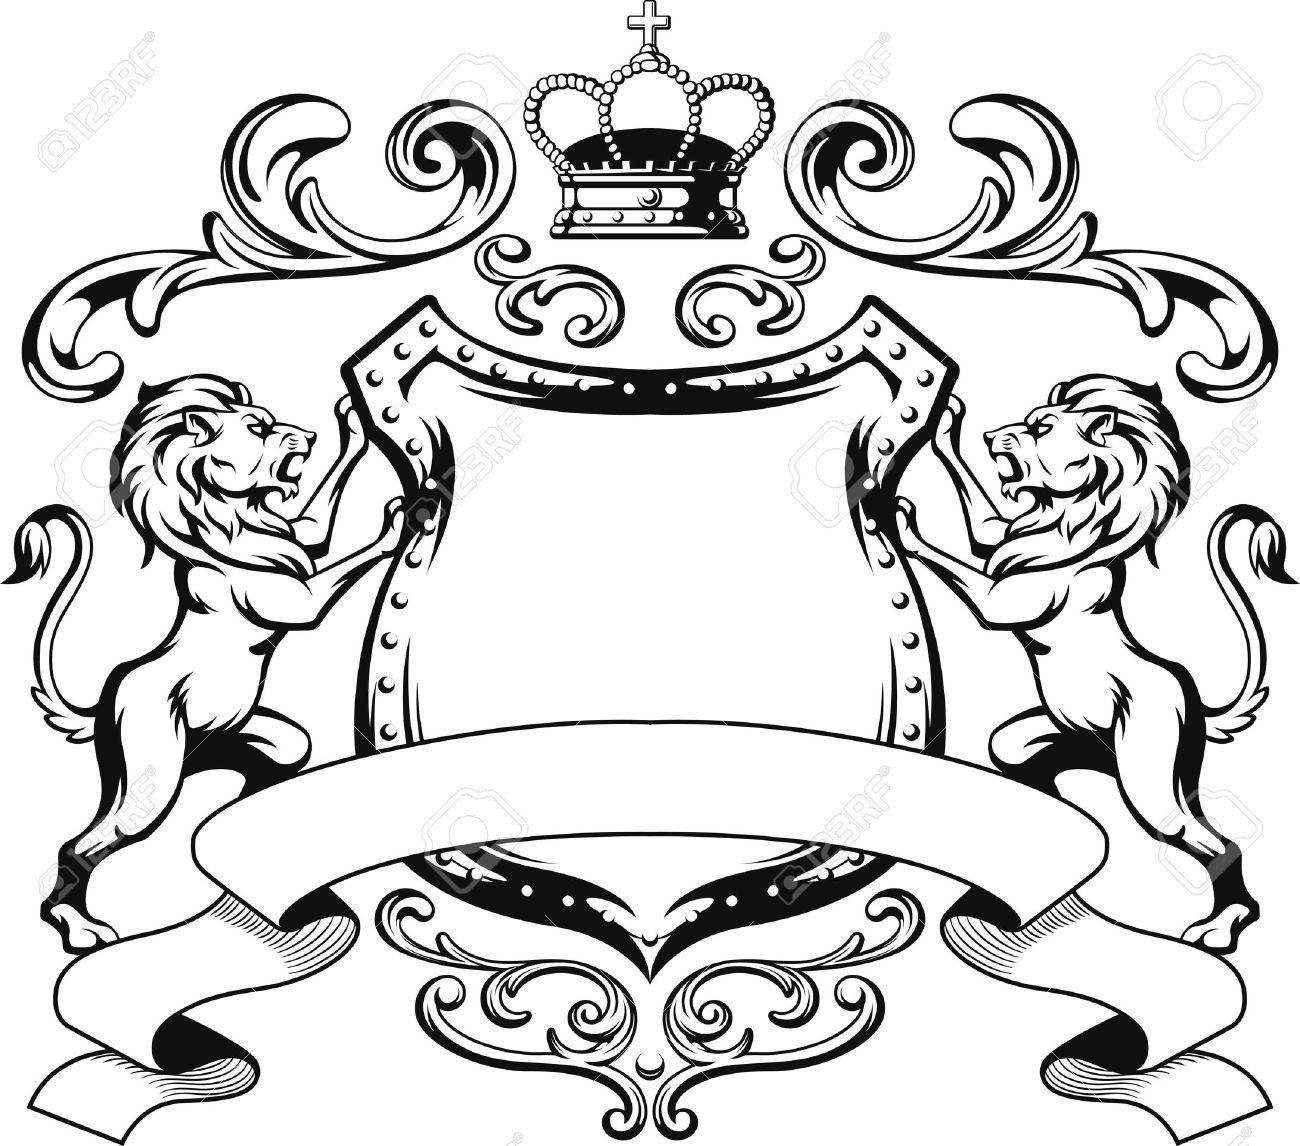 Heraldic Lion Shield Crest Silhouette - 45286208